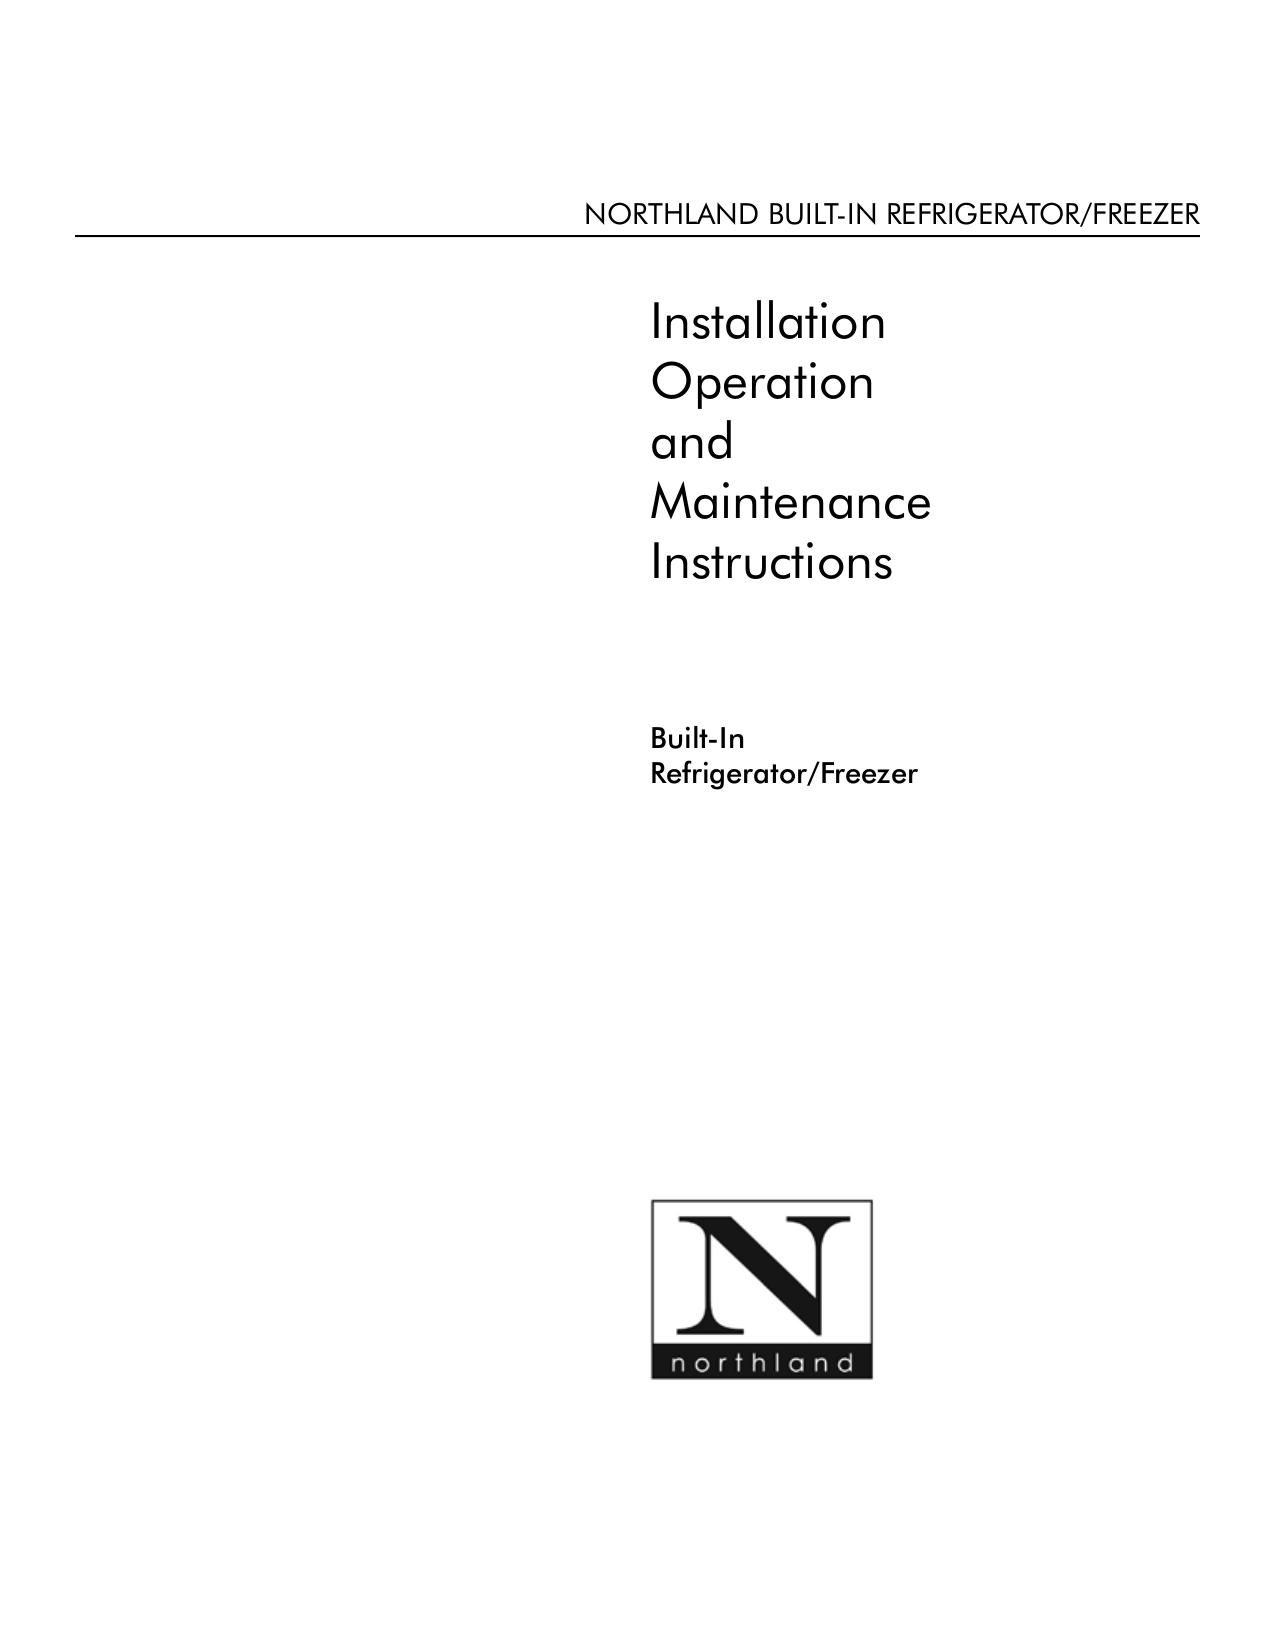 pdf for Northland Other 18WC-SGP Wine Cooler manual